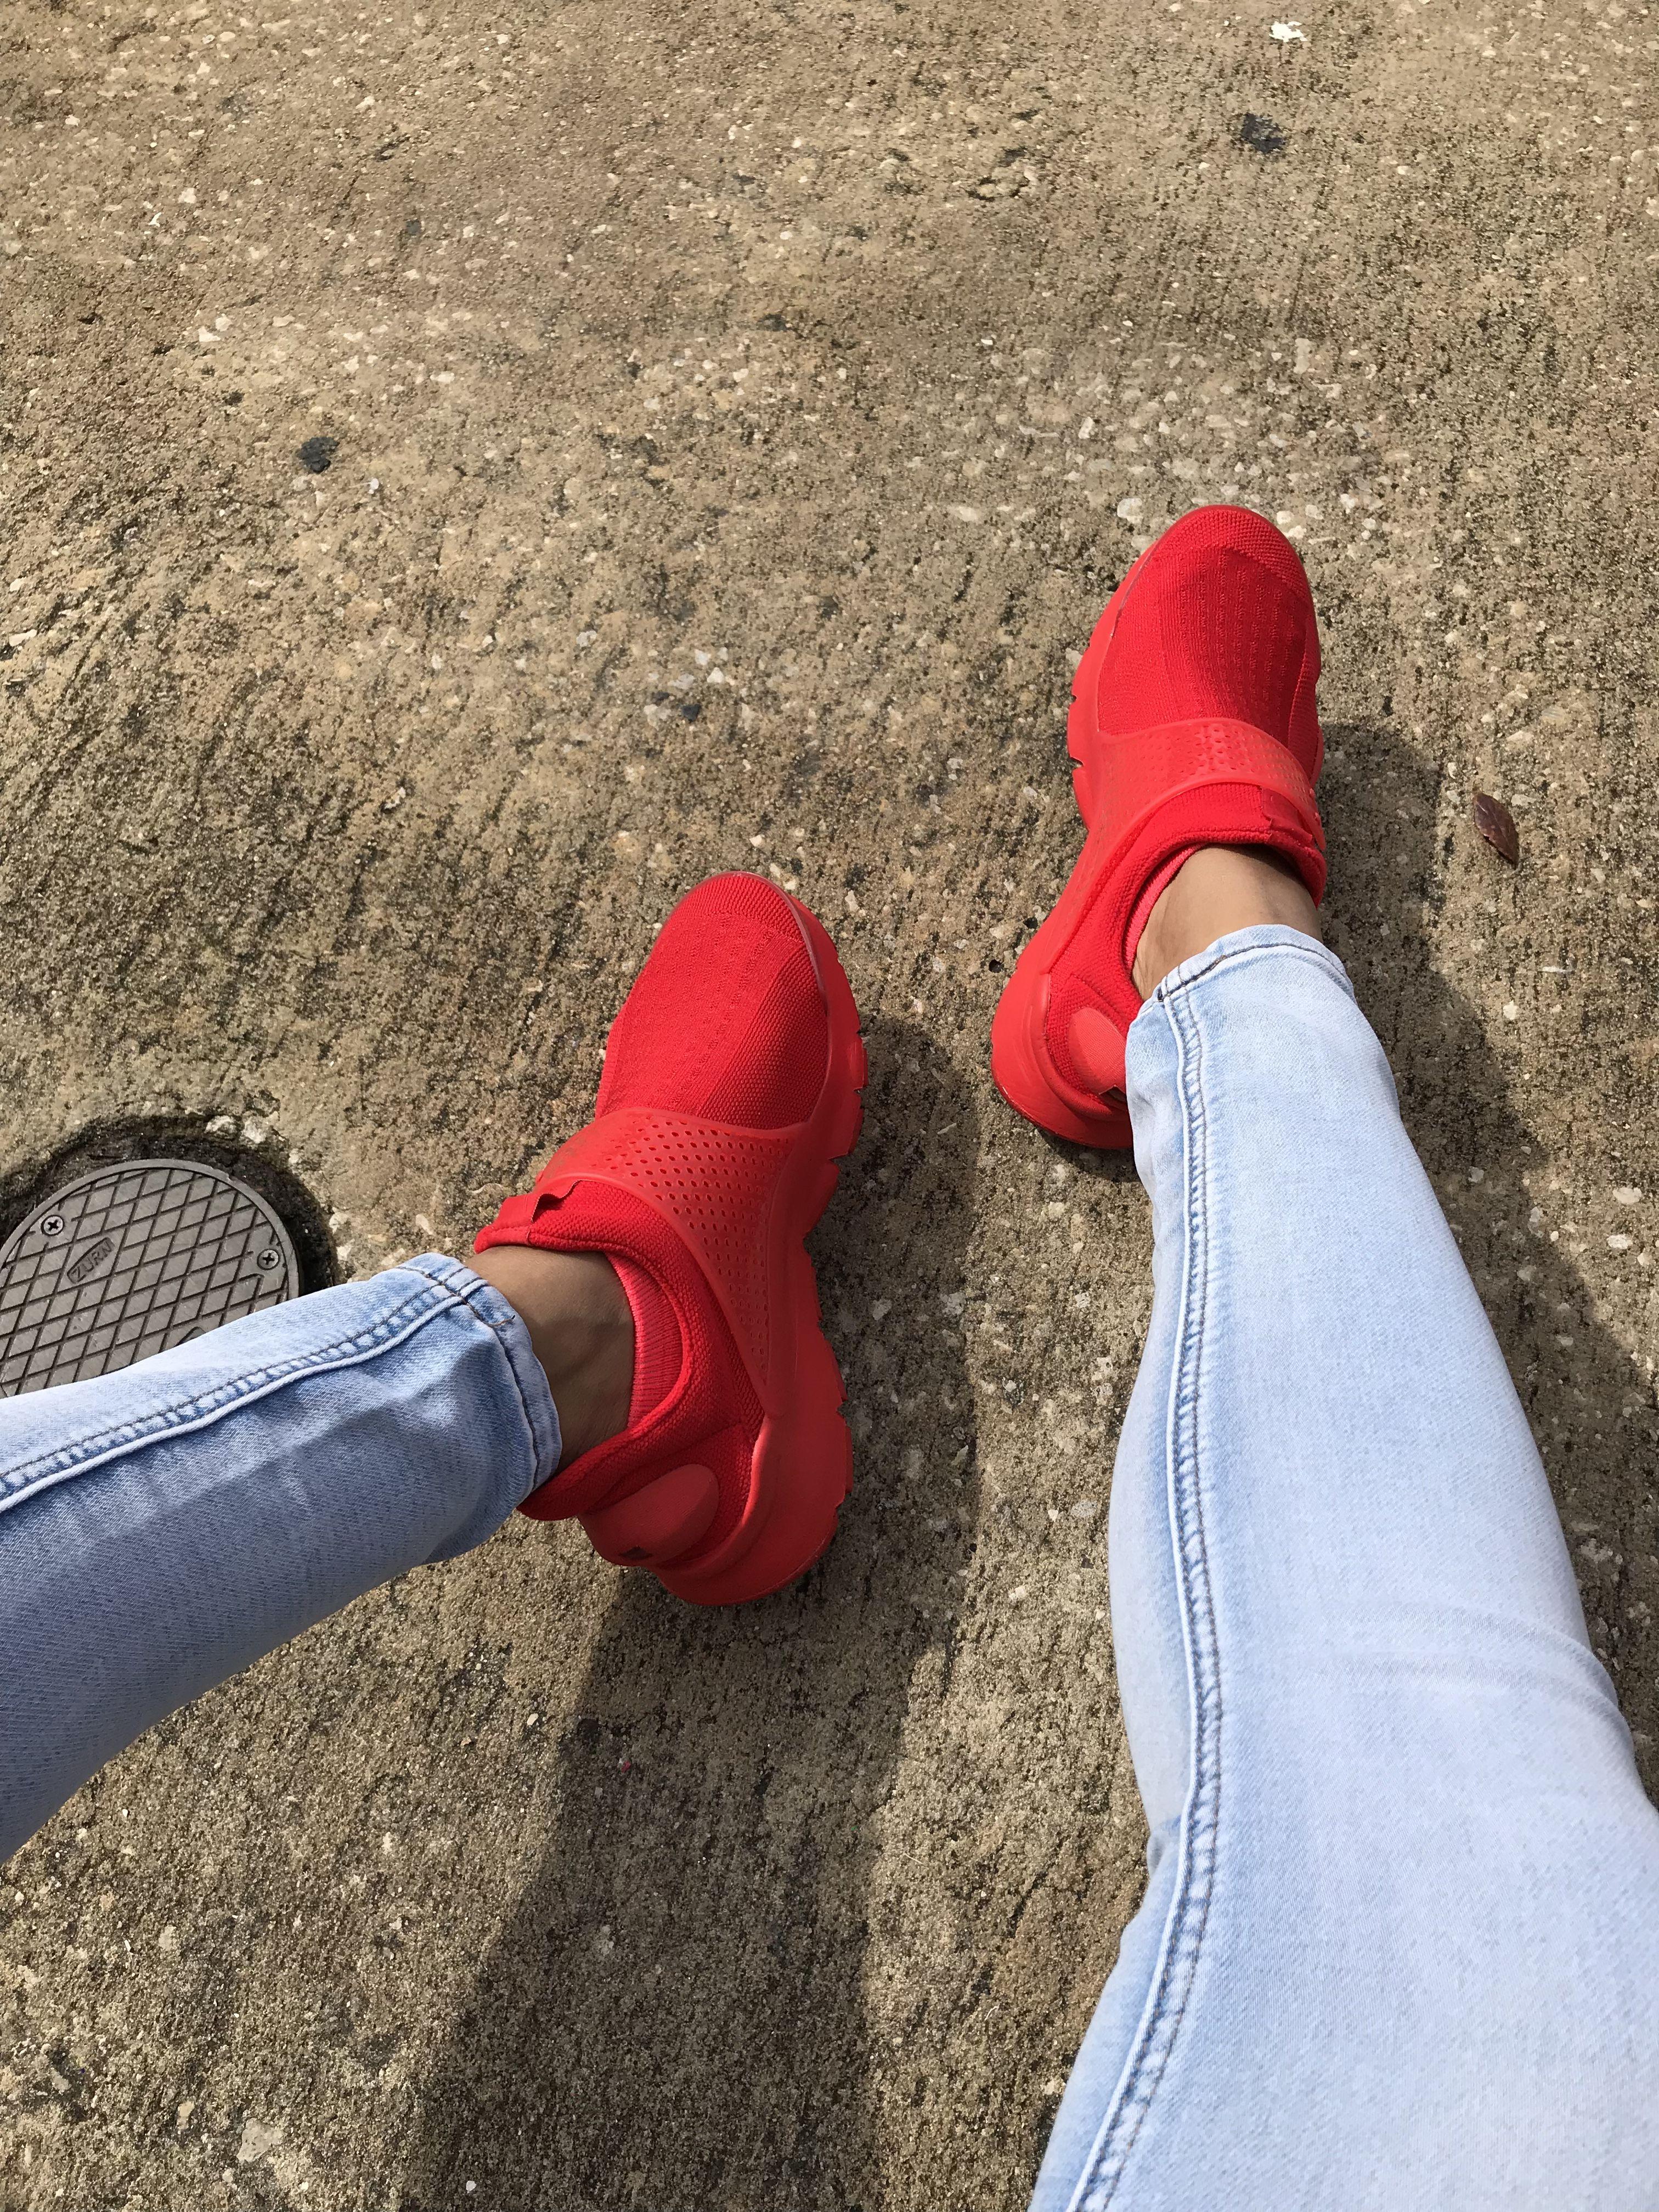 nike sock darts | Shoes, Sneakers, Sock